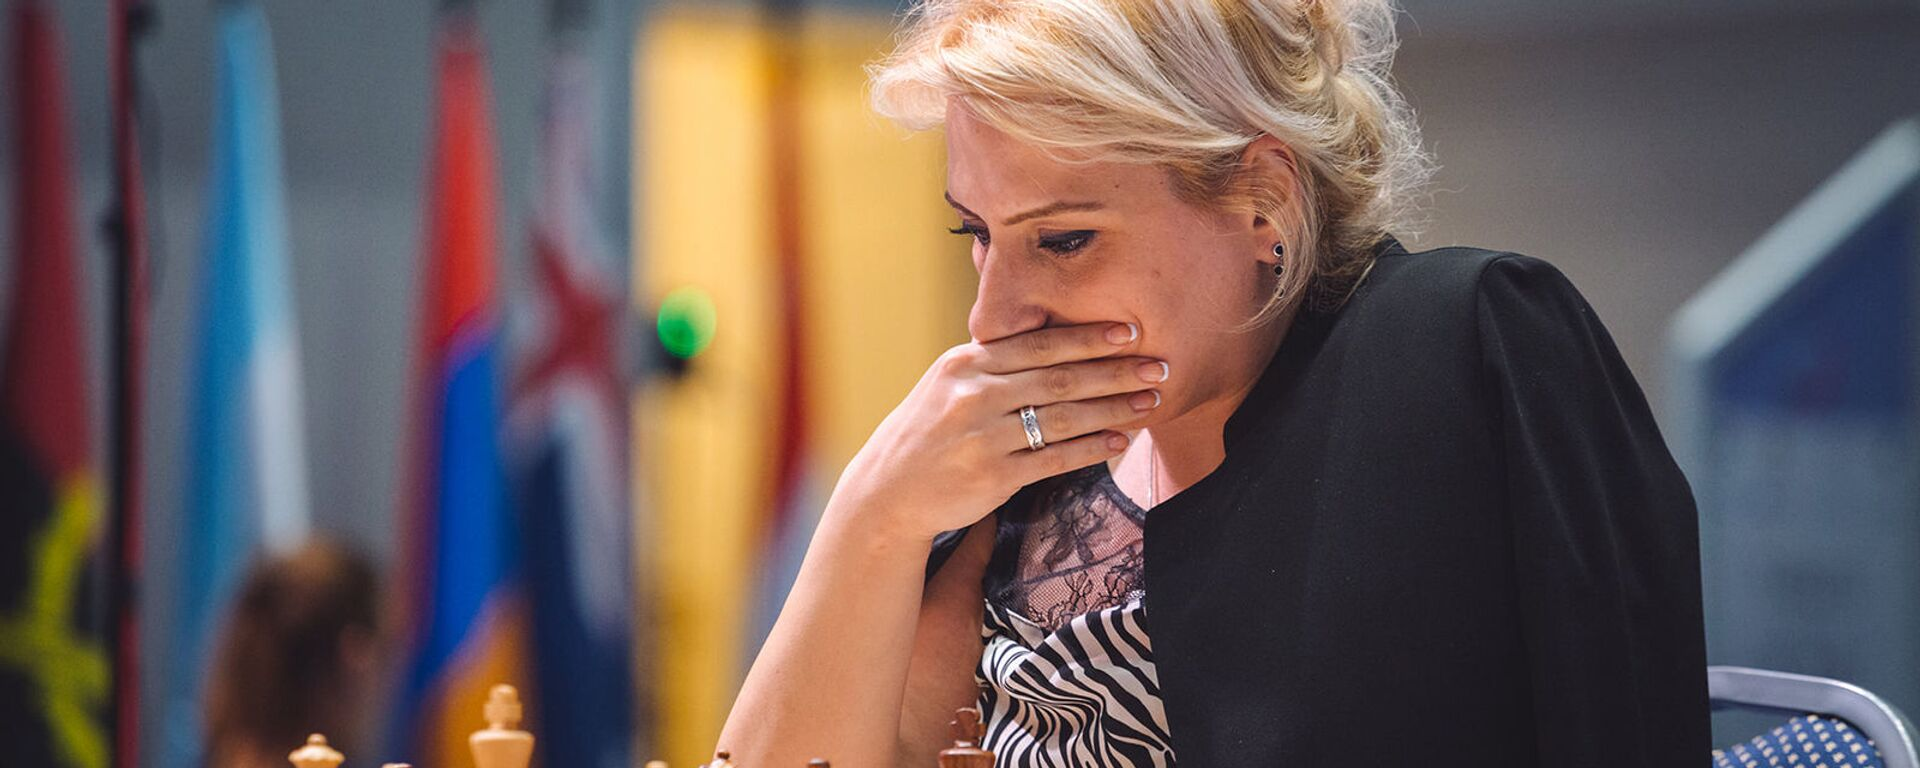 Элина Даниелян на Чемпионате мира по шахматам в Сочи - Sputnik Արմենիա, 1920, 12.08.2021